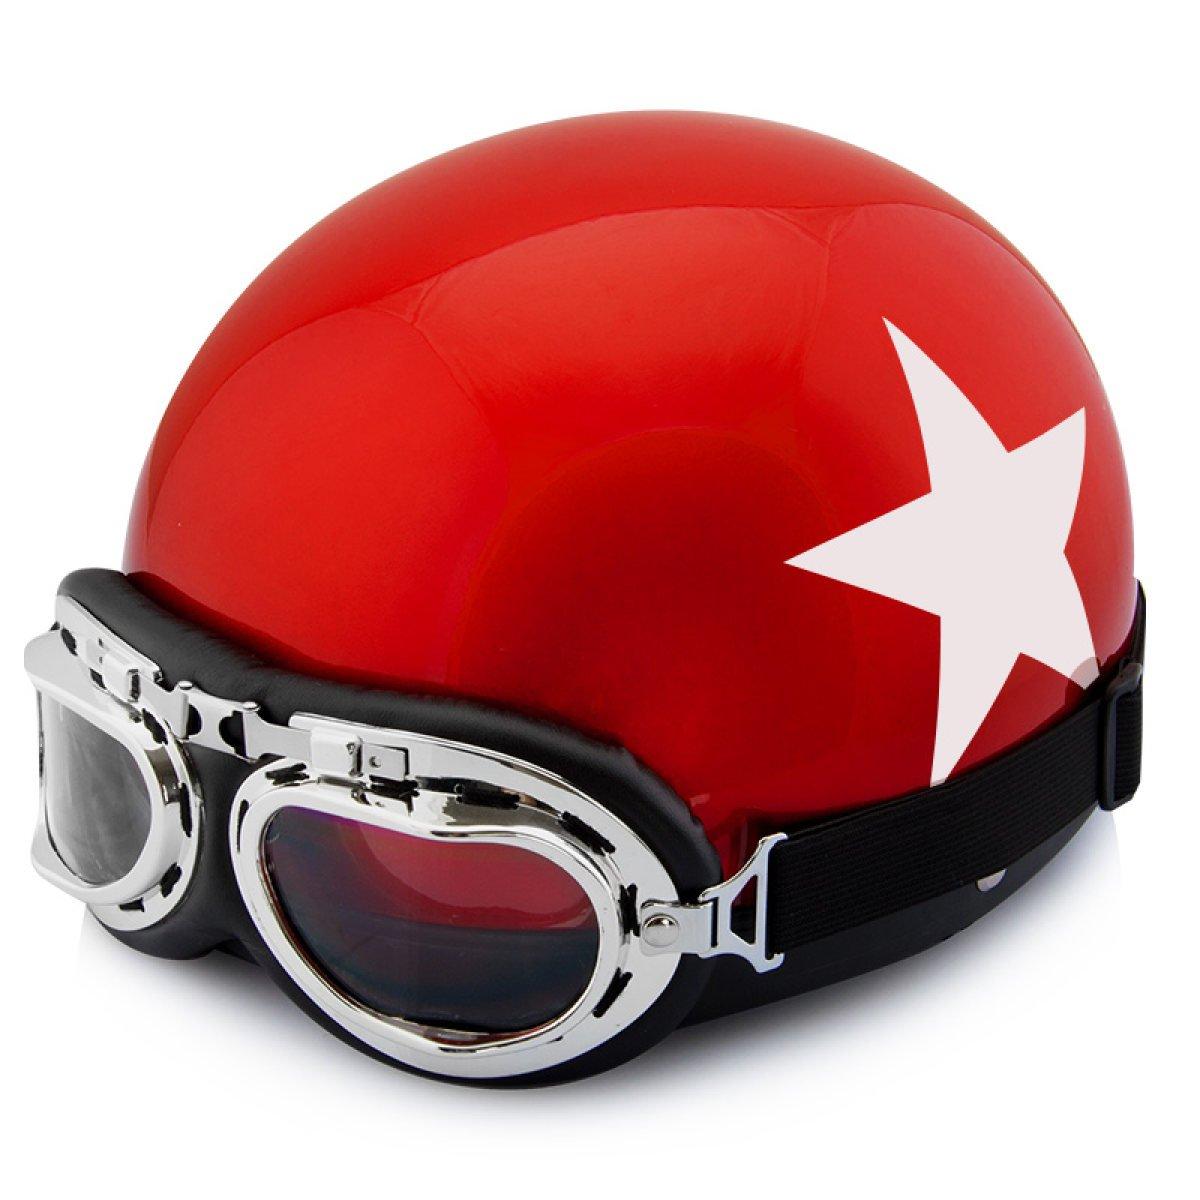 TZQ Half-coveROT Anti-fog Damen Half Helm Männer Mode Wrestling Hut Motorrad Batterie Auto Helm